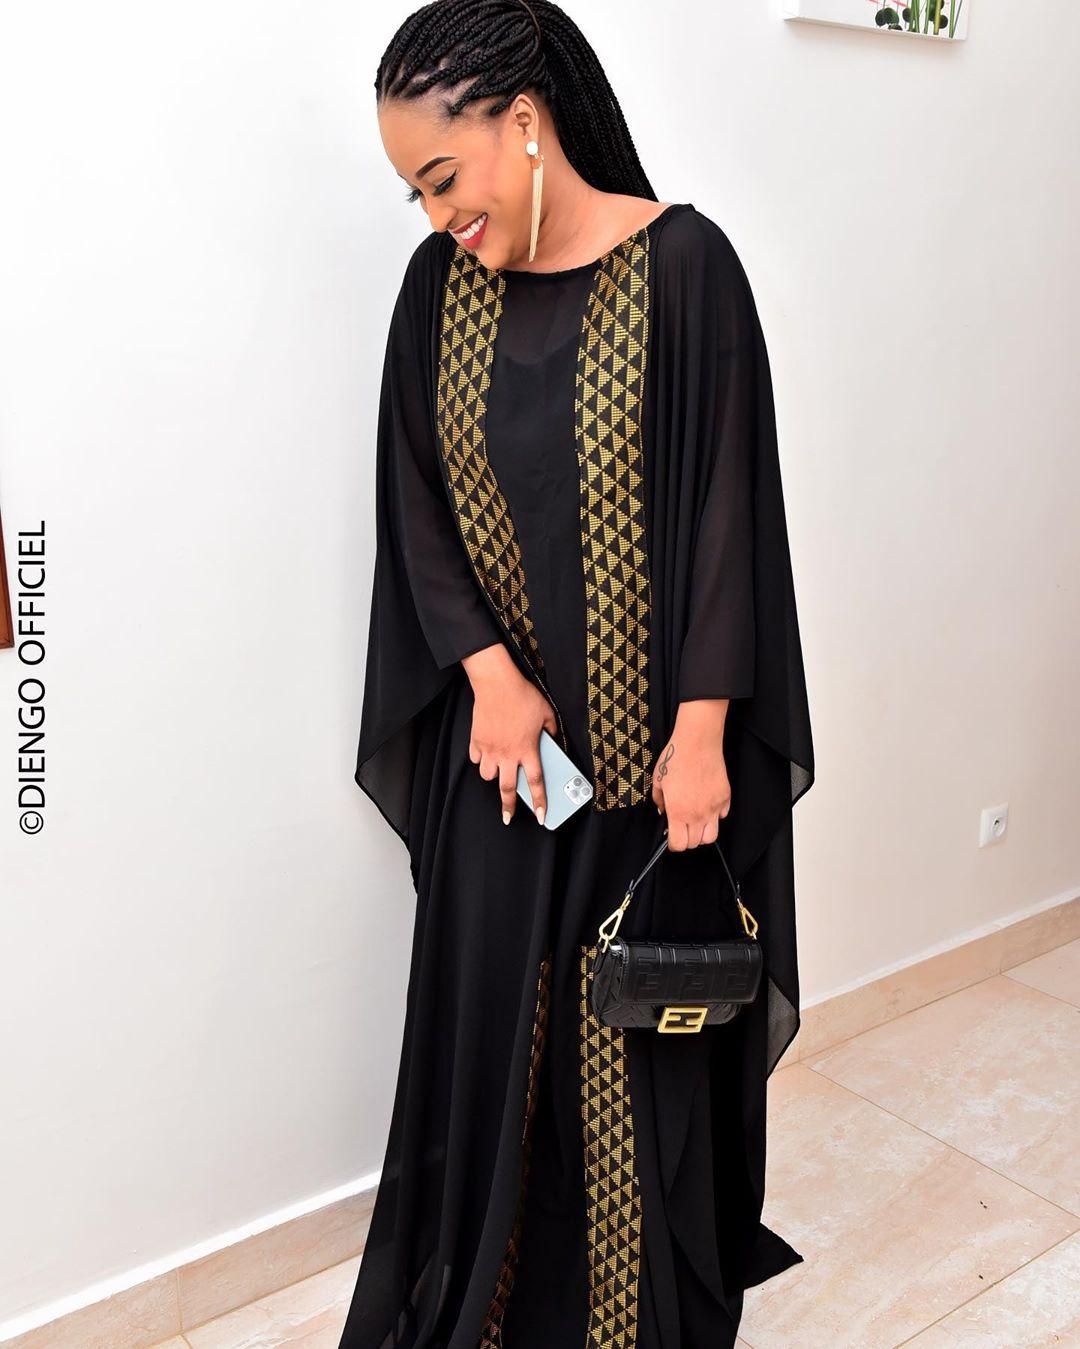 Racky MHDM sublime en robe noire